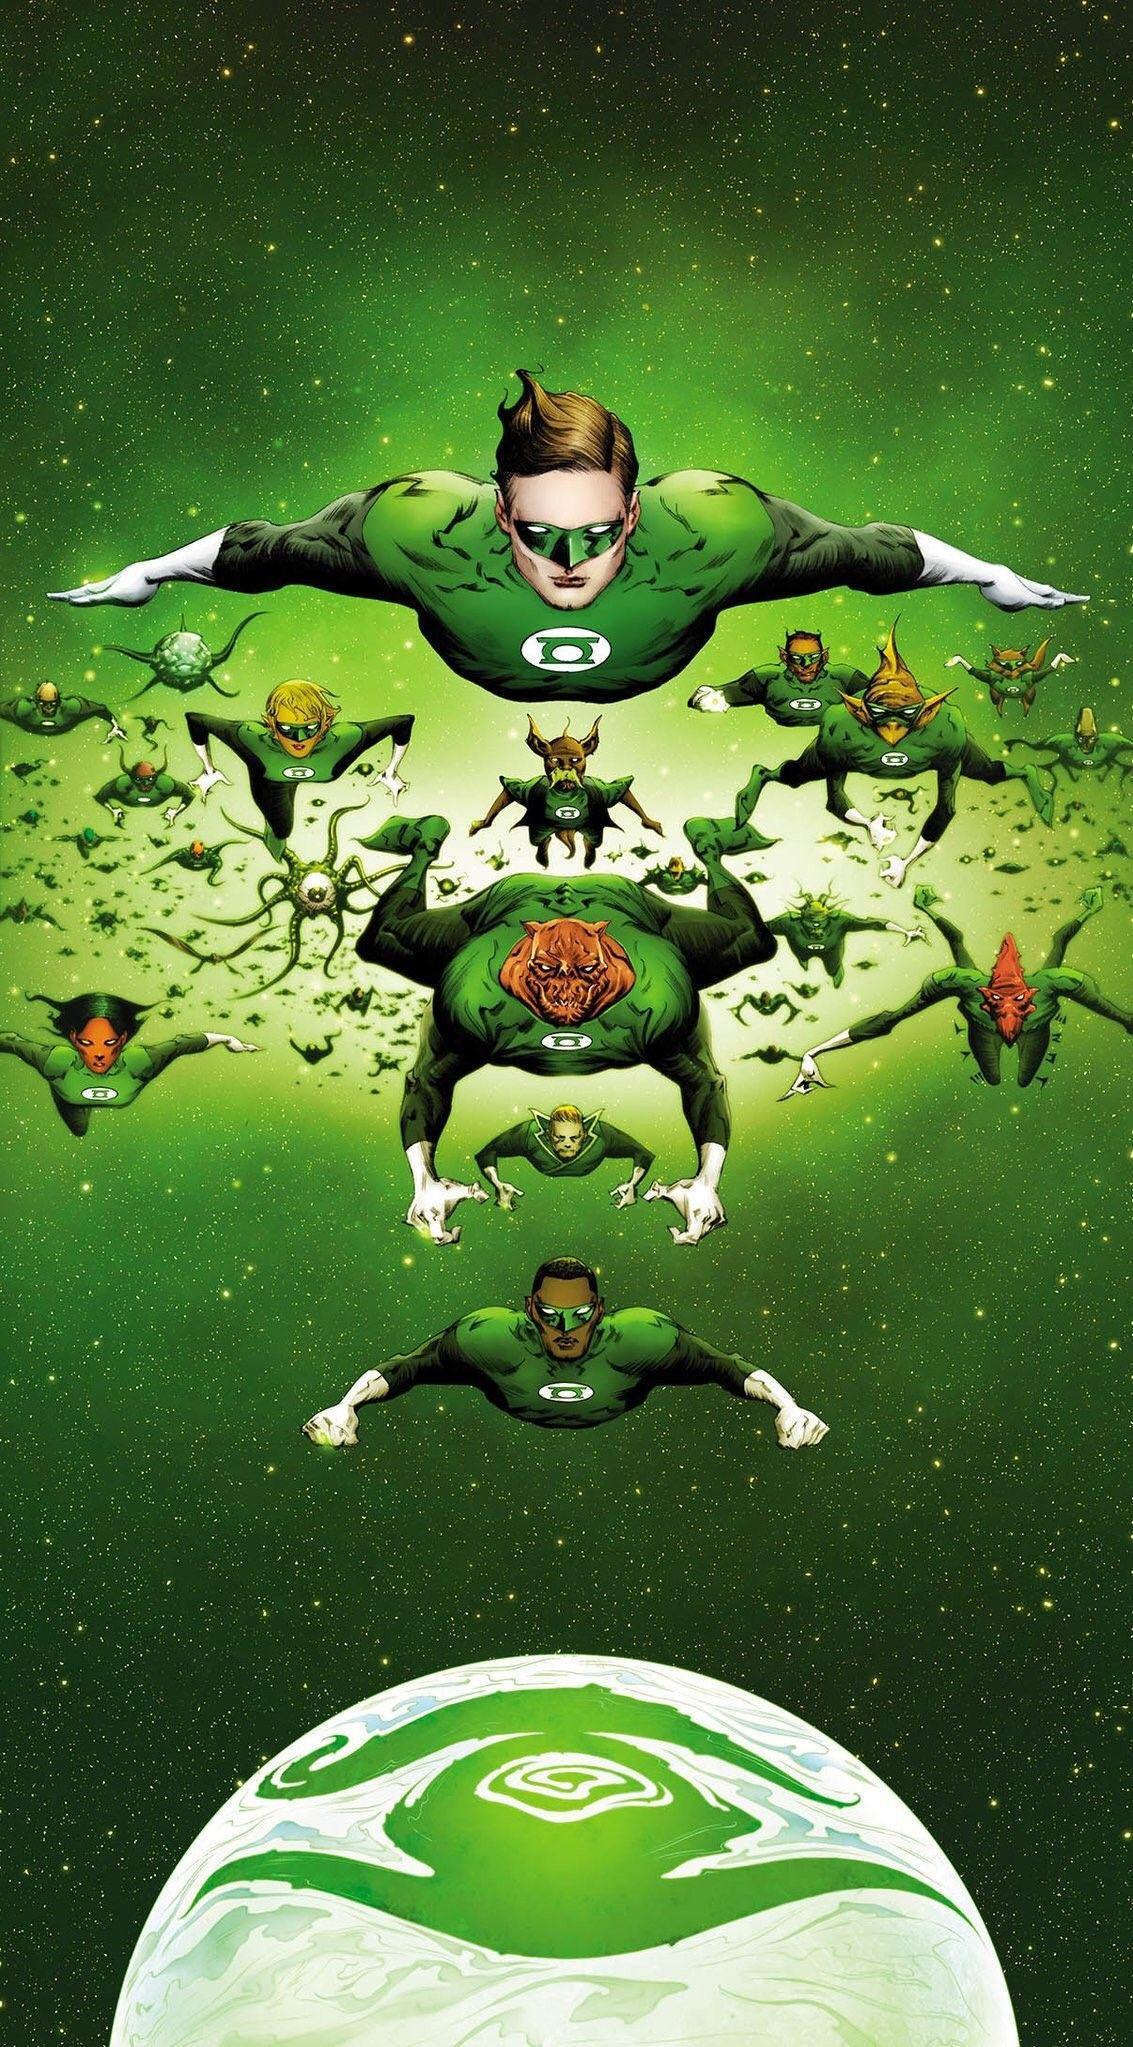 DC Comics GREEN LANTERNS #45 first printing cover A